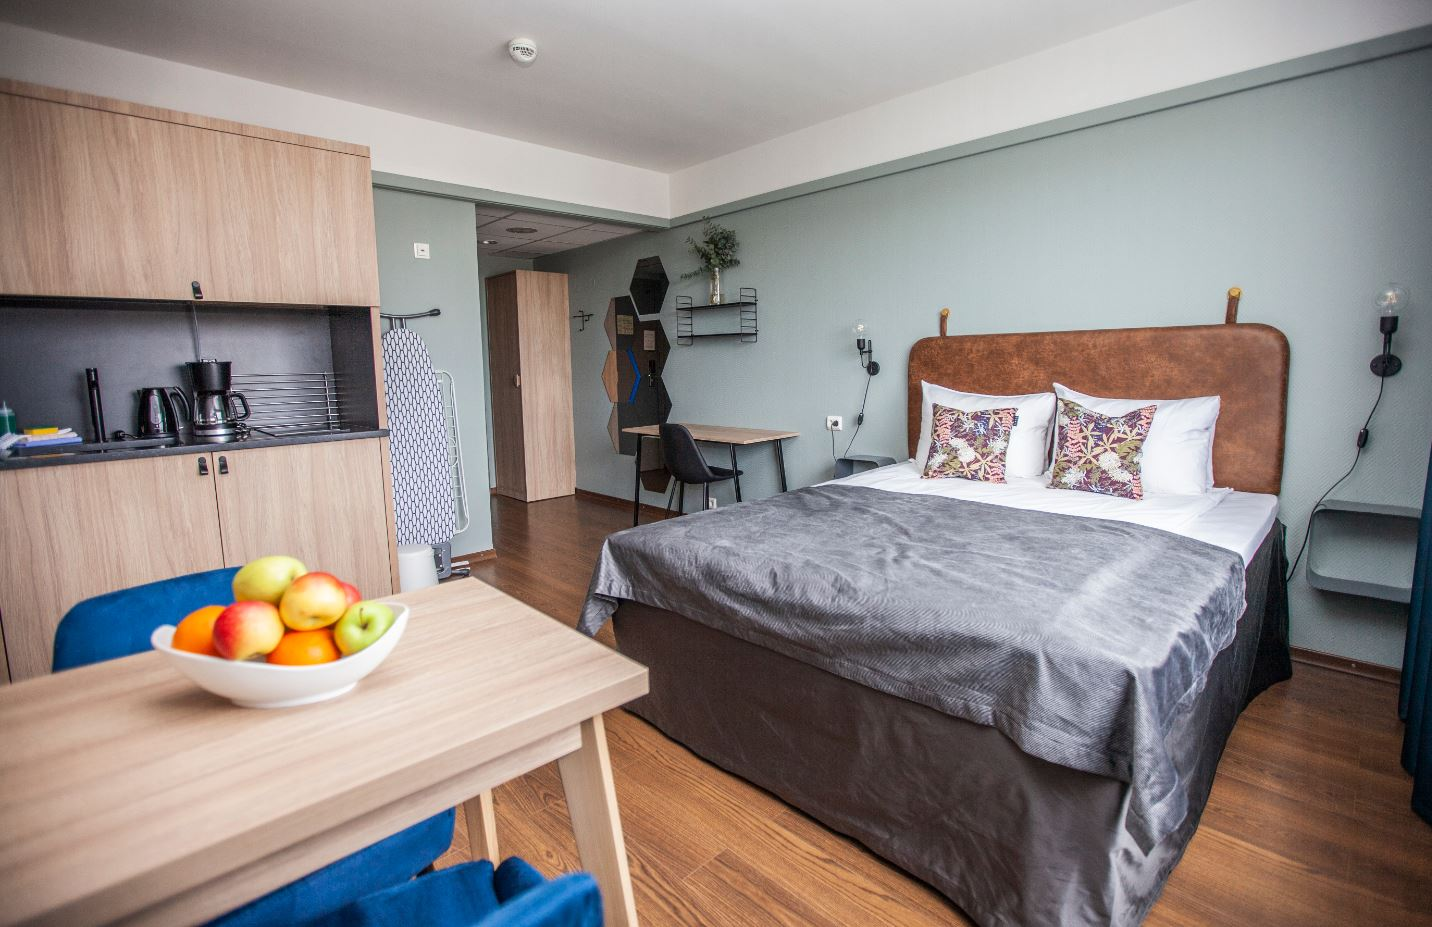 Studio at Lagårdsveien 61 Serviced Apartments - Citybase Apartments